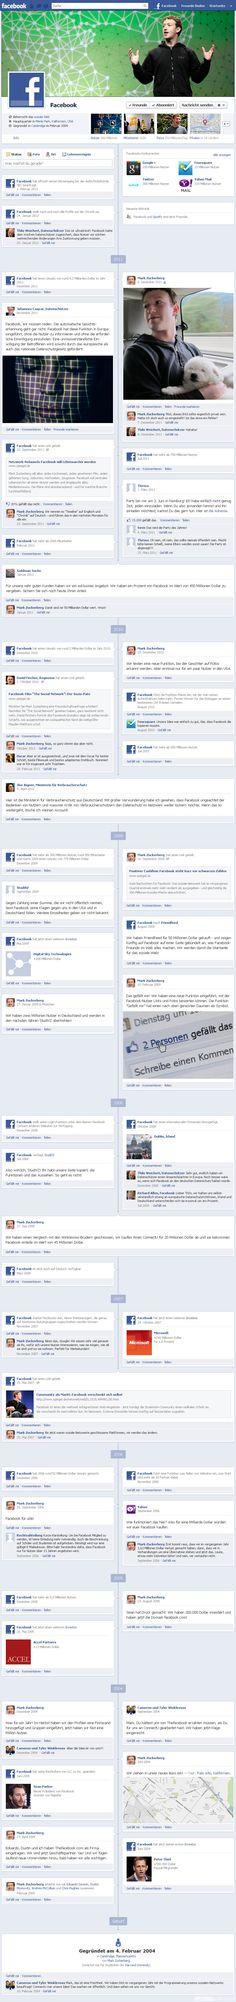 Facebook's Timeline by Spiegel Online